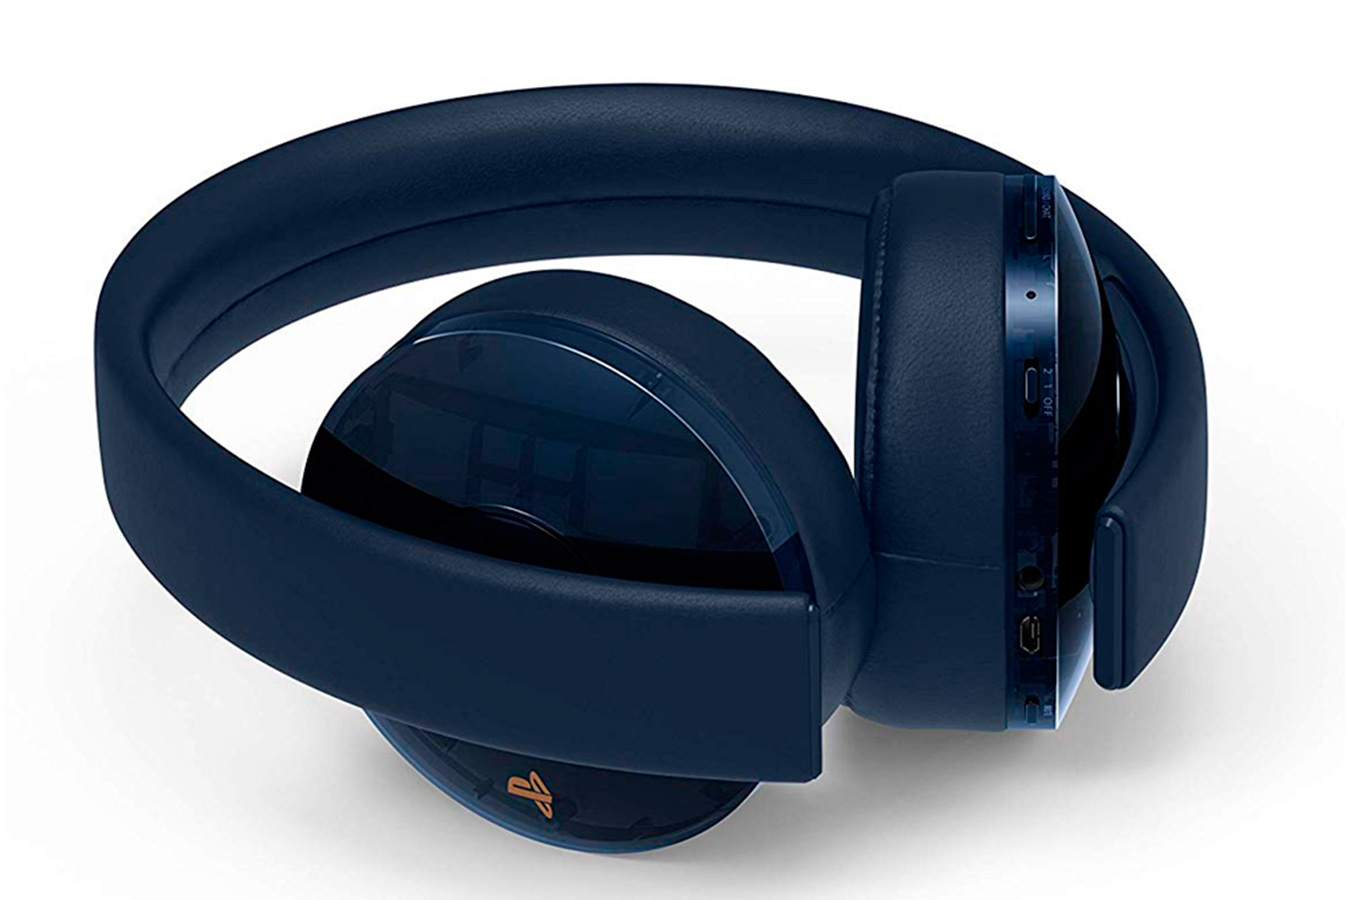 500 Million Limited Stereo Headset изображение 2